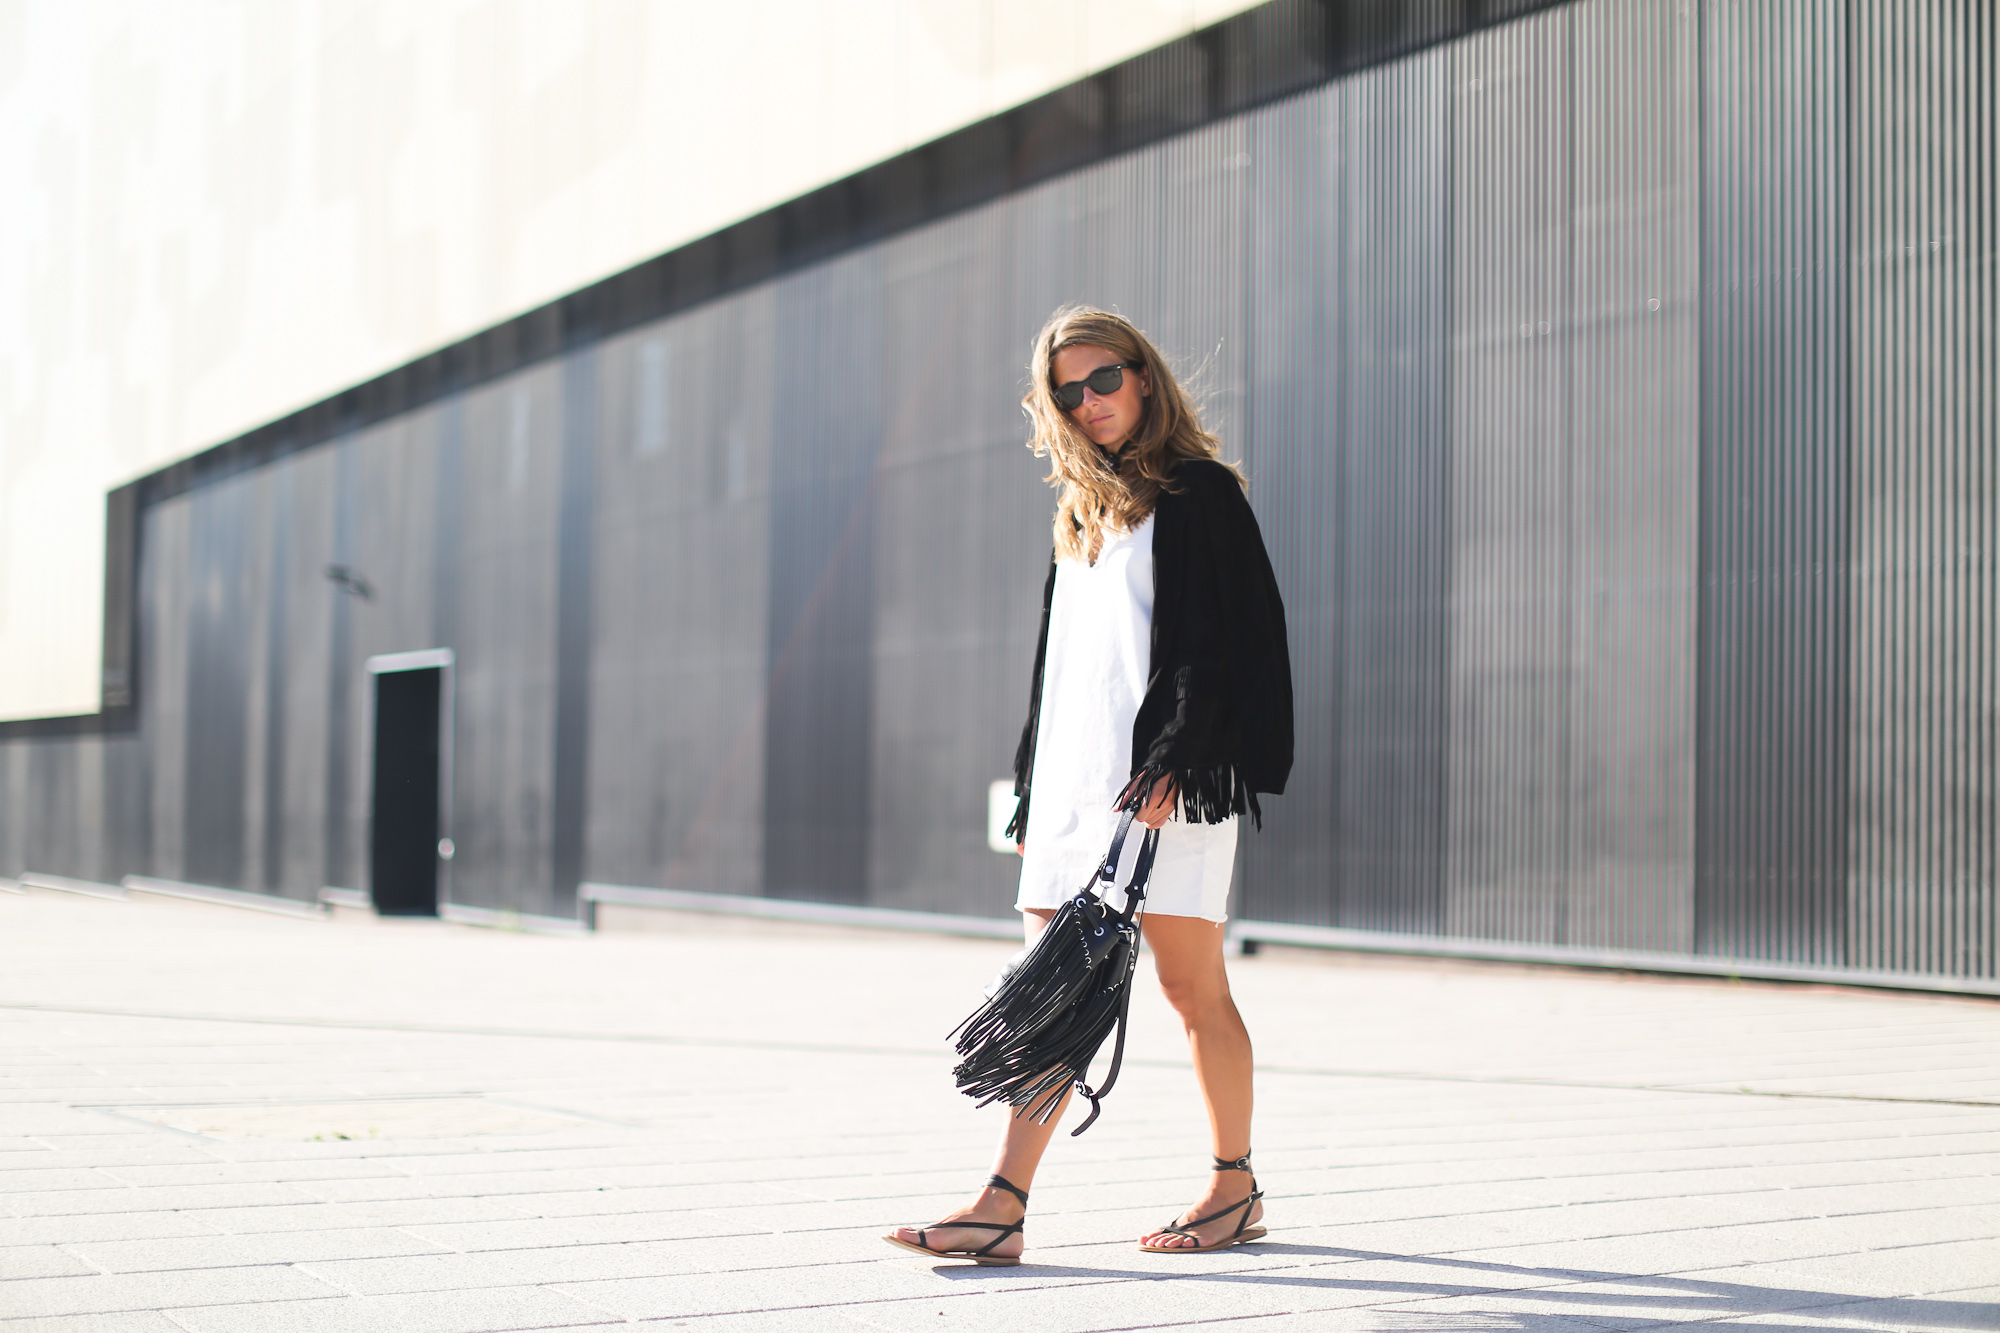 Clochet_streetstyle_sandro_anik_bag_artimisia_roman_leather_Sandals-2